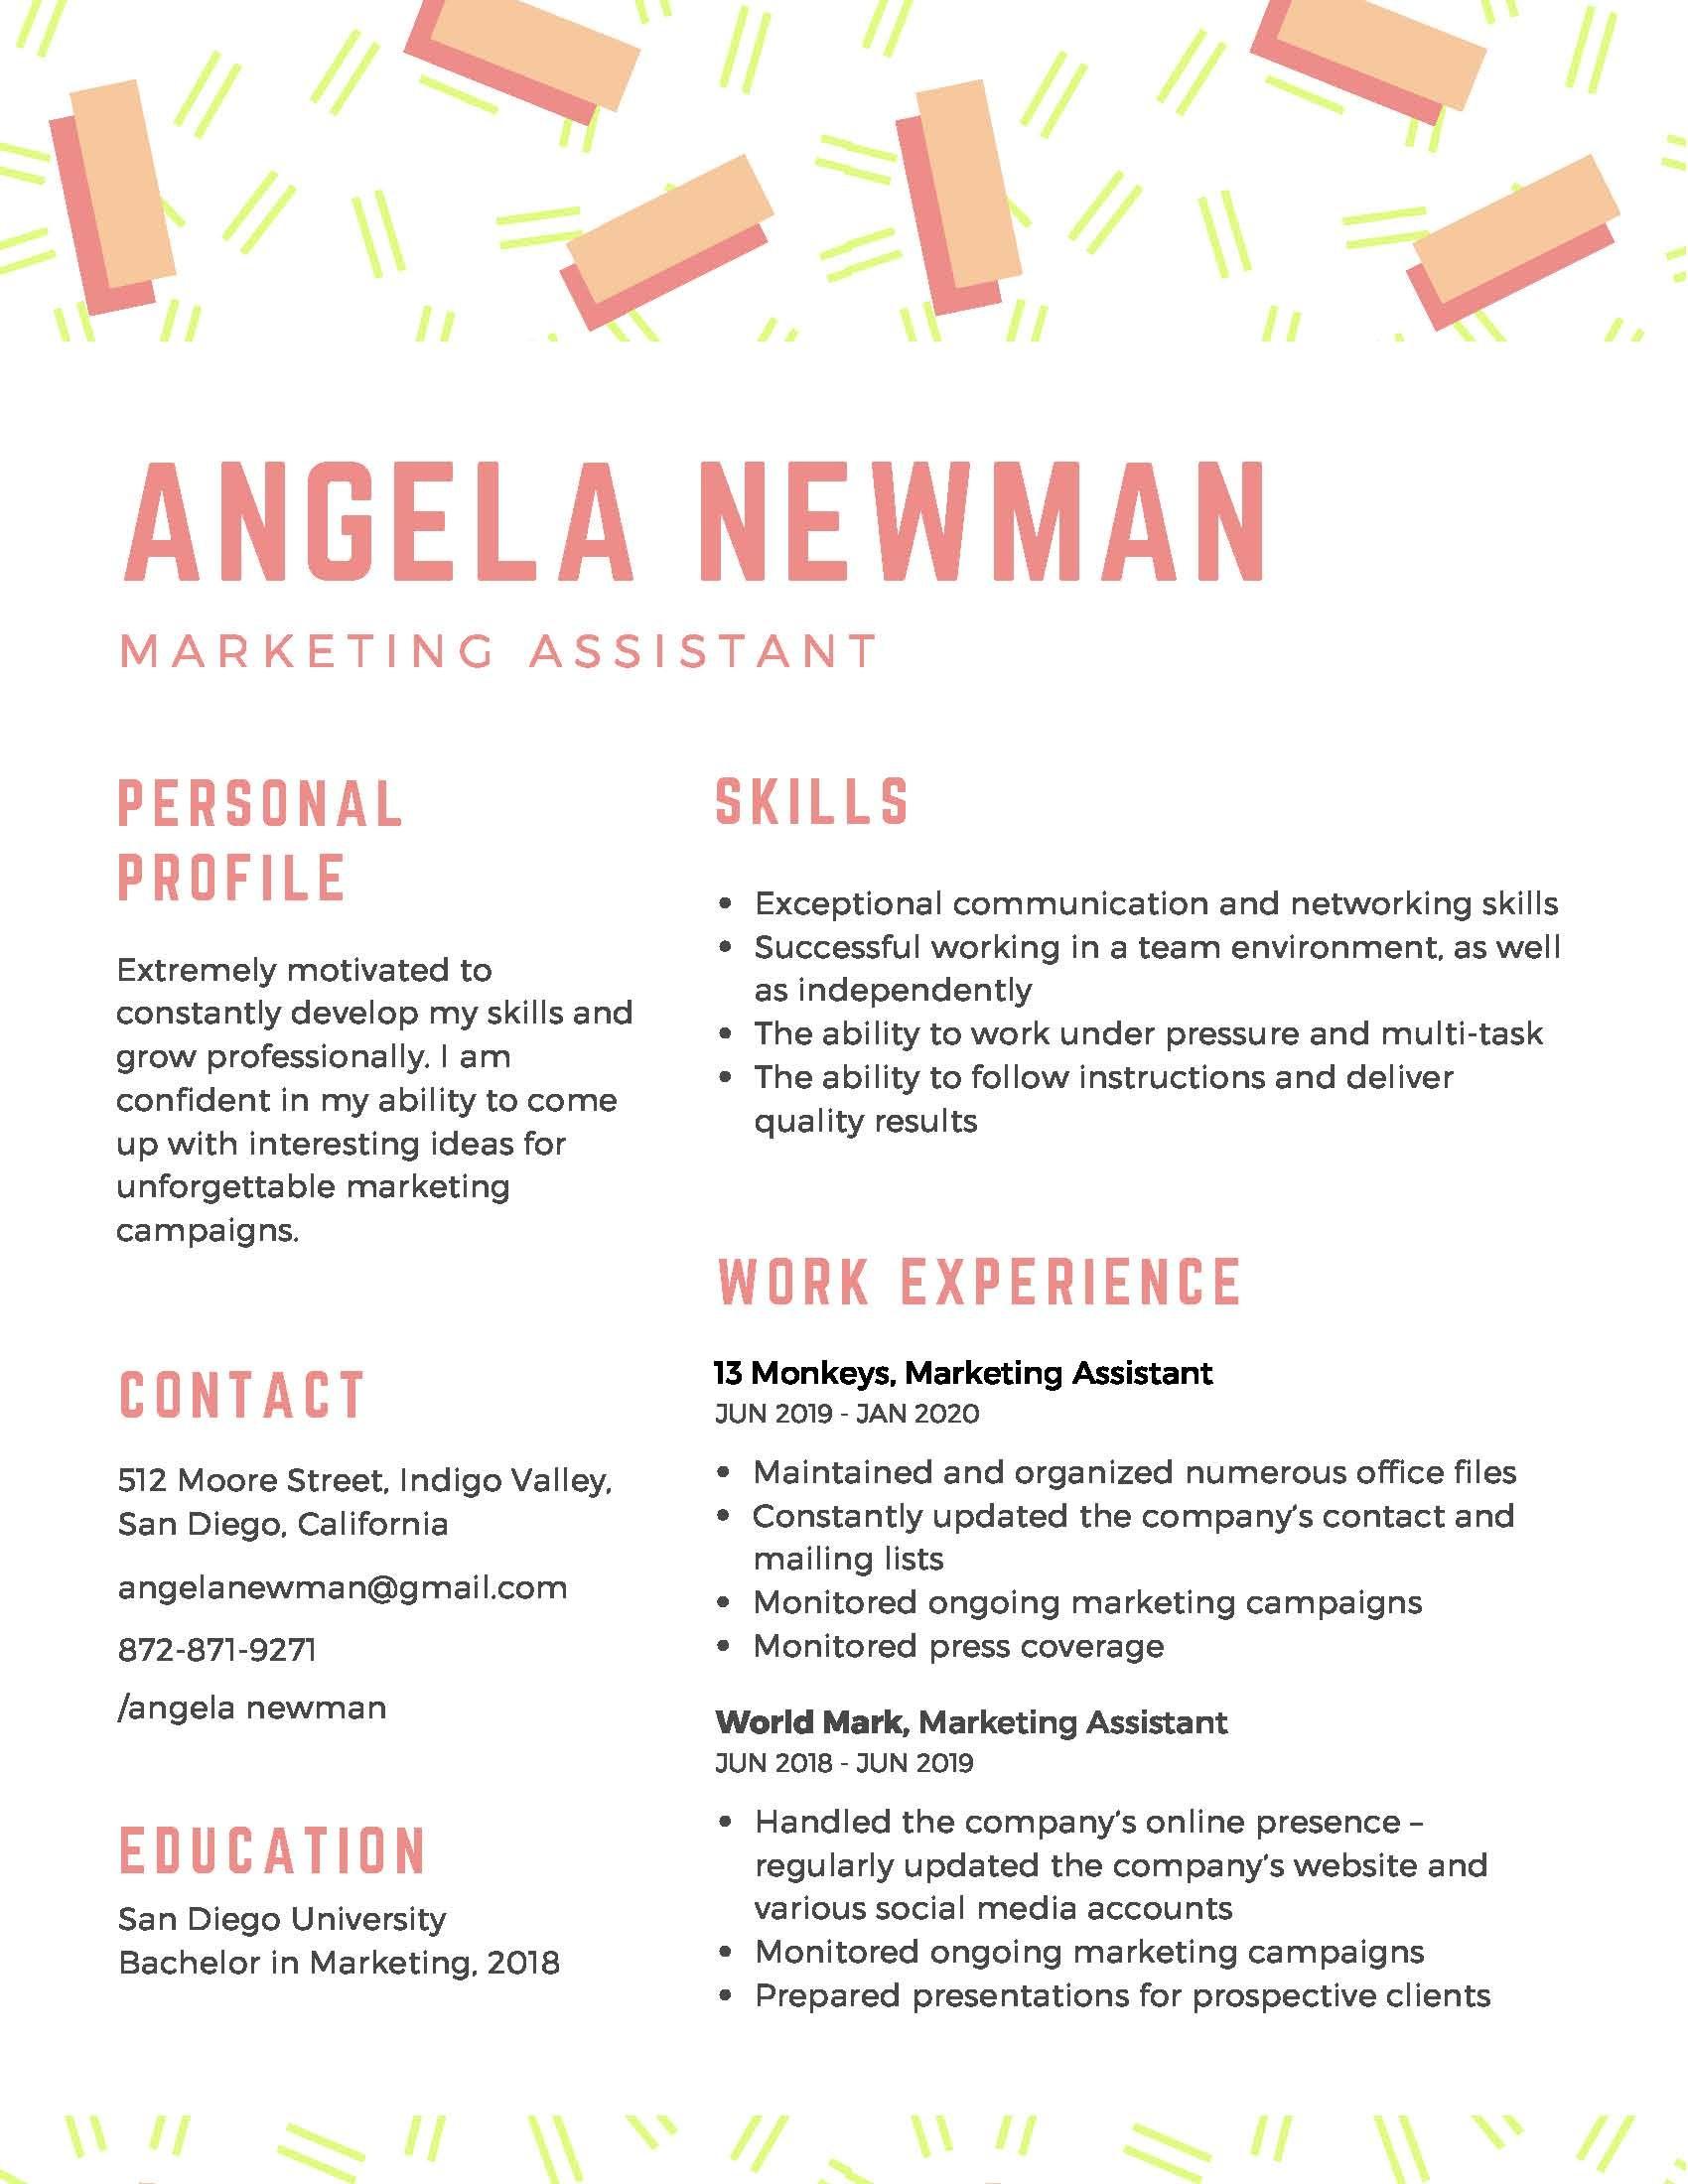 Design your Resume https://www.fiverr.com/s2/c2d6a10cda | Designer ...